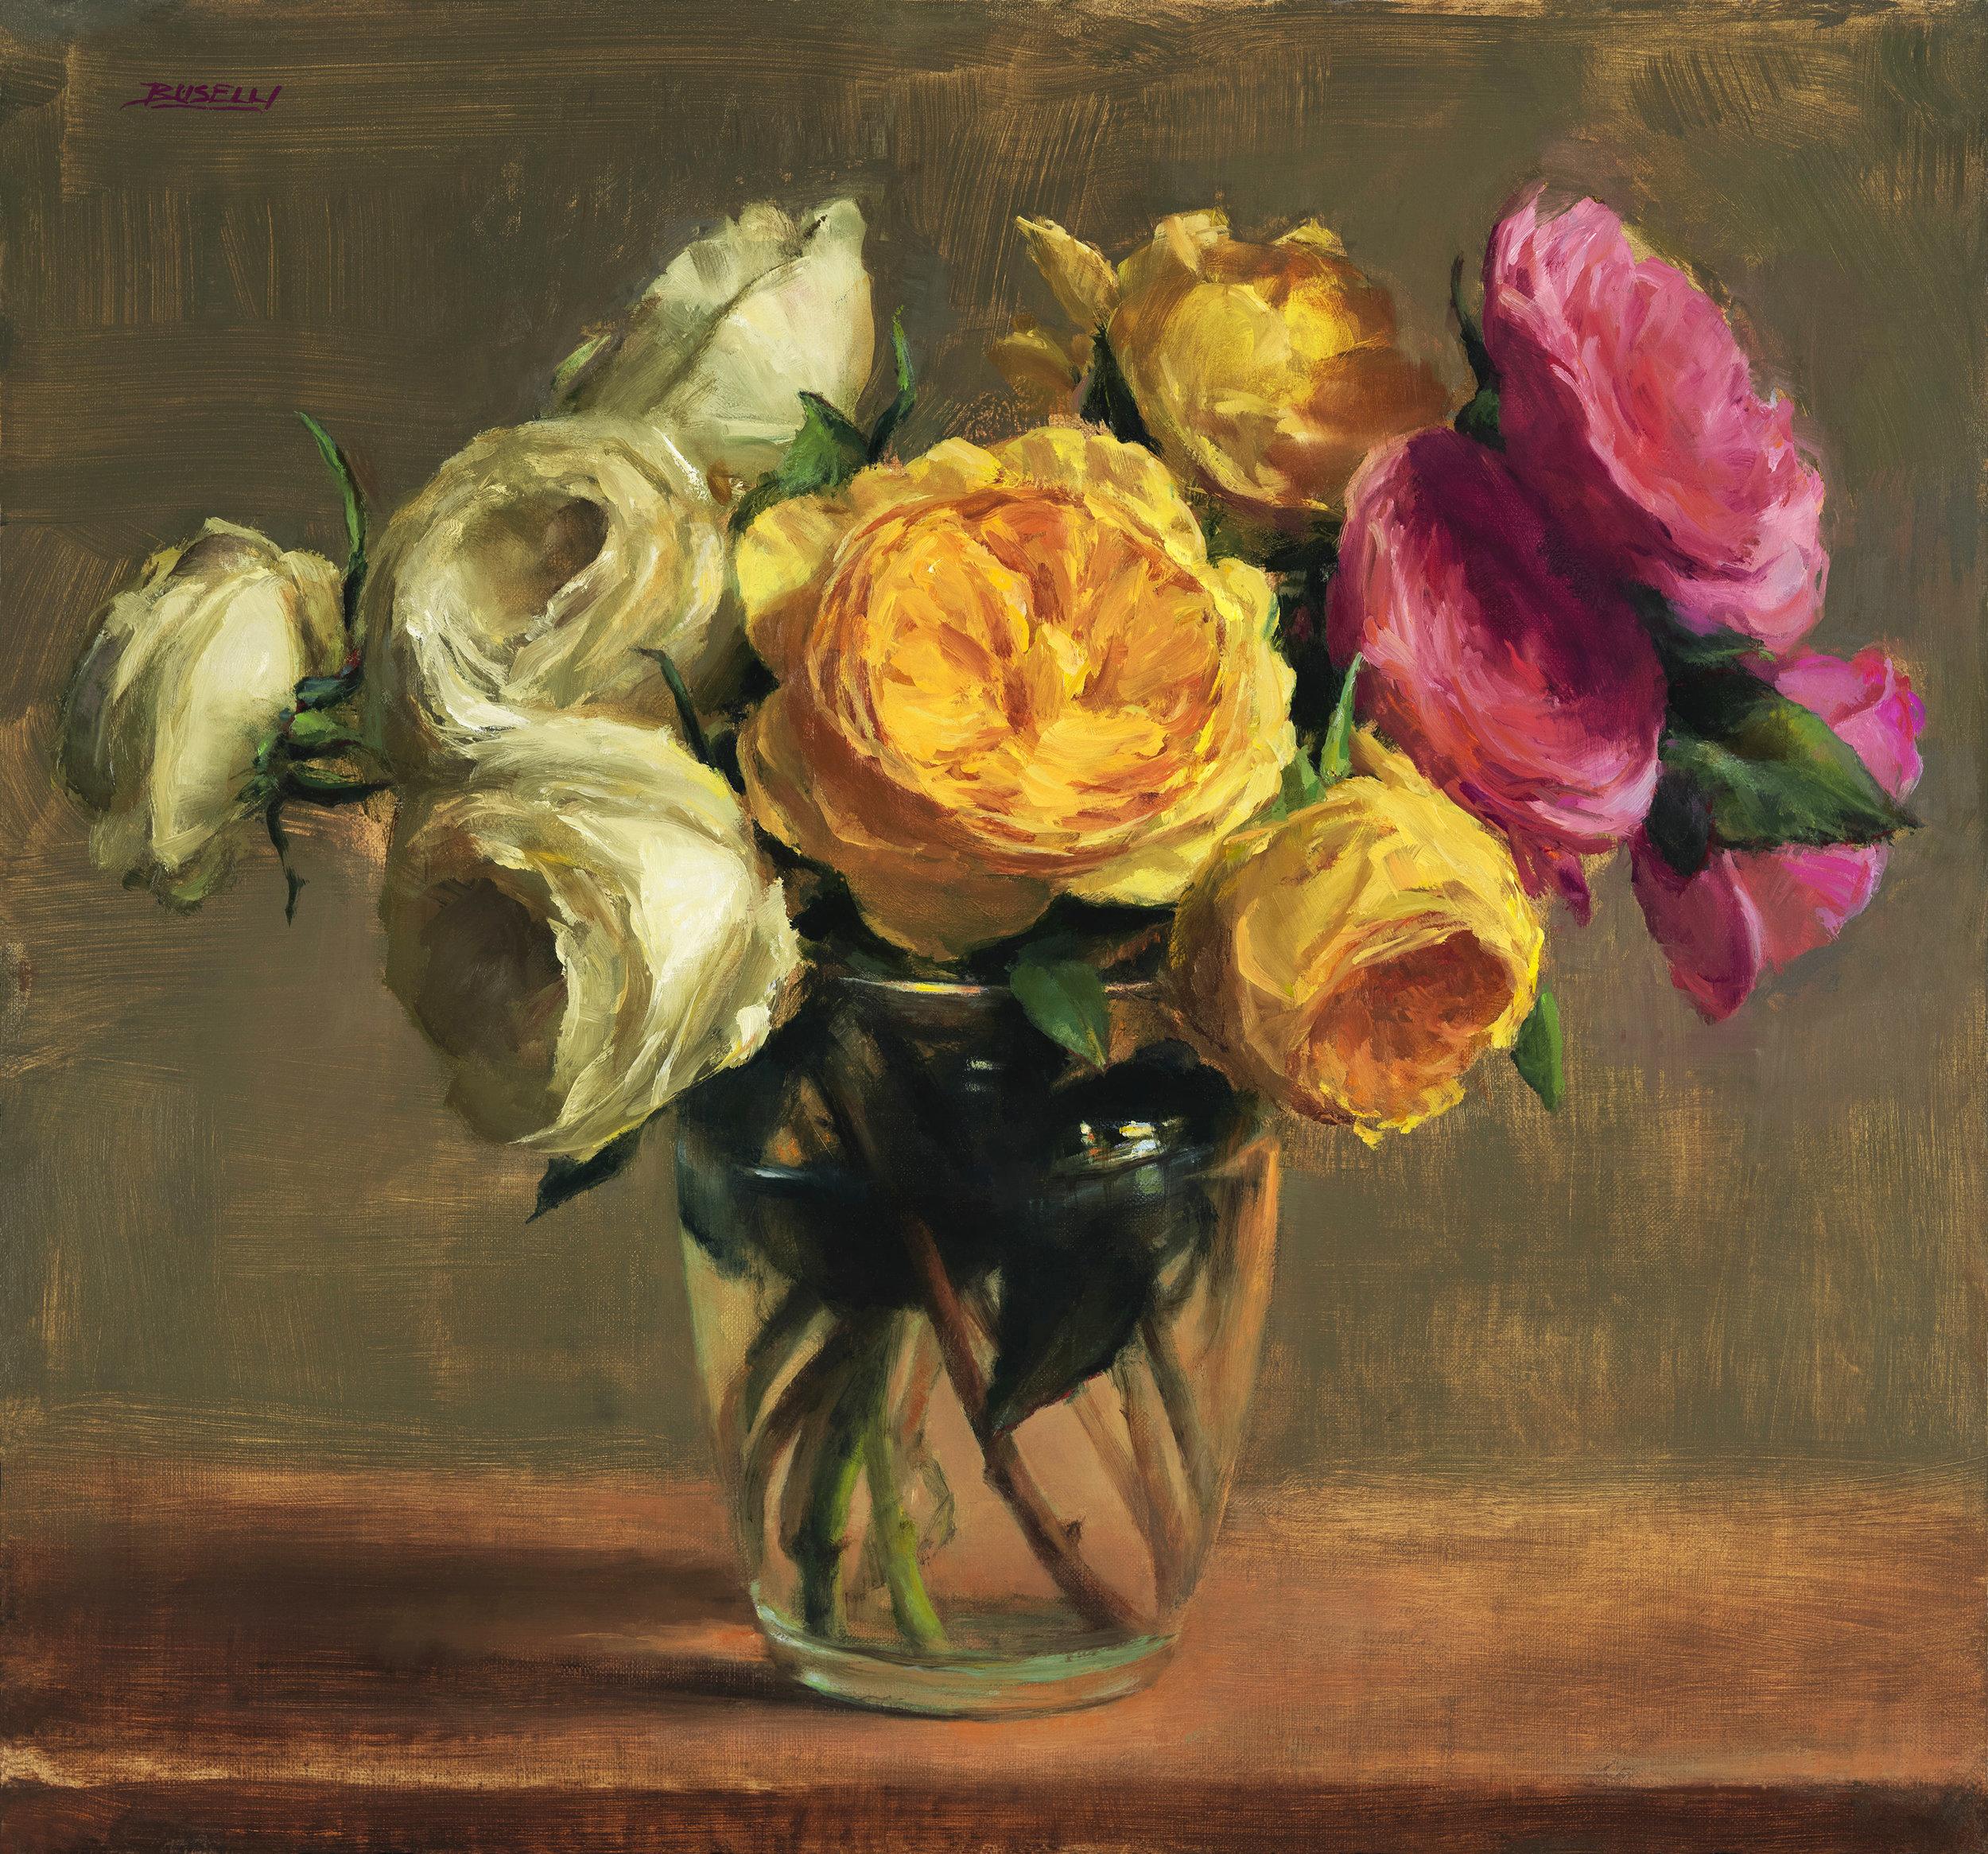 David Austen Roses_Ellen Buselli - ARC 19.jpg